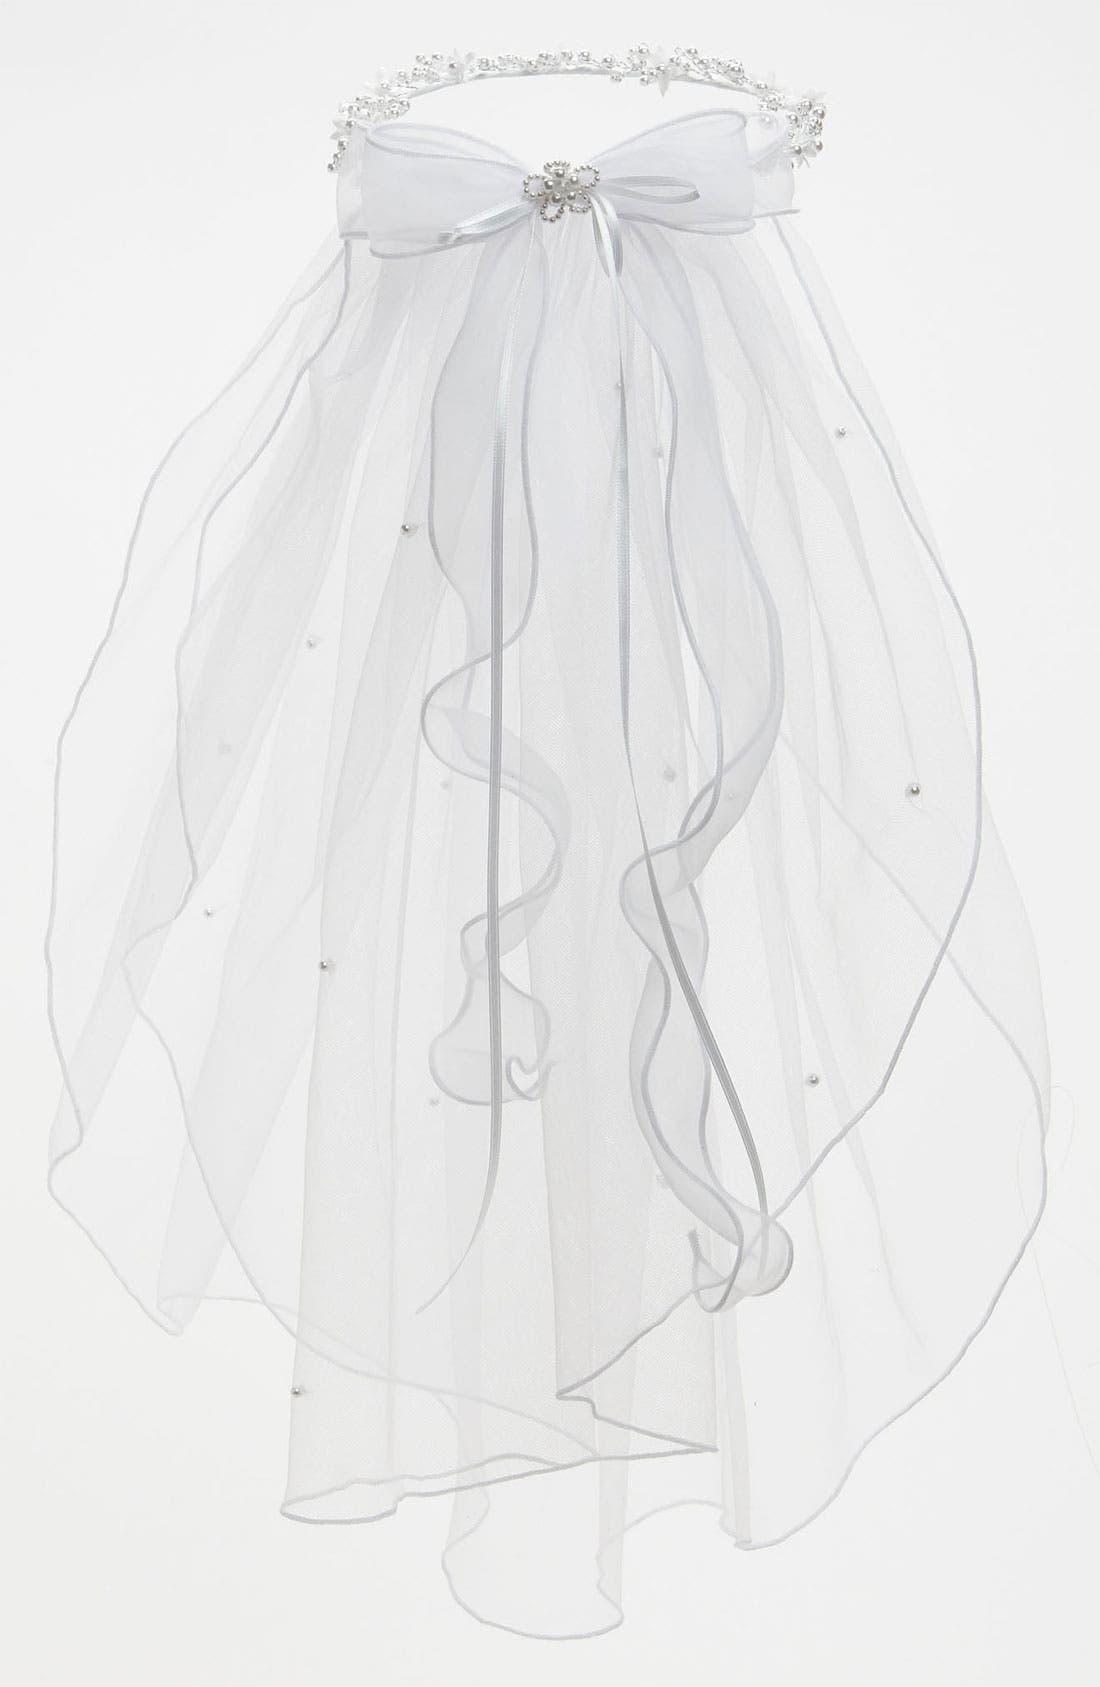 Alternate Image 1 Selected - Lauren Marie Beaded Wreath & Veil (Girls)